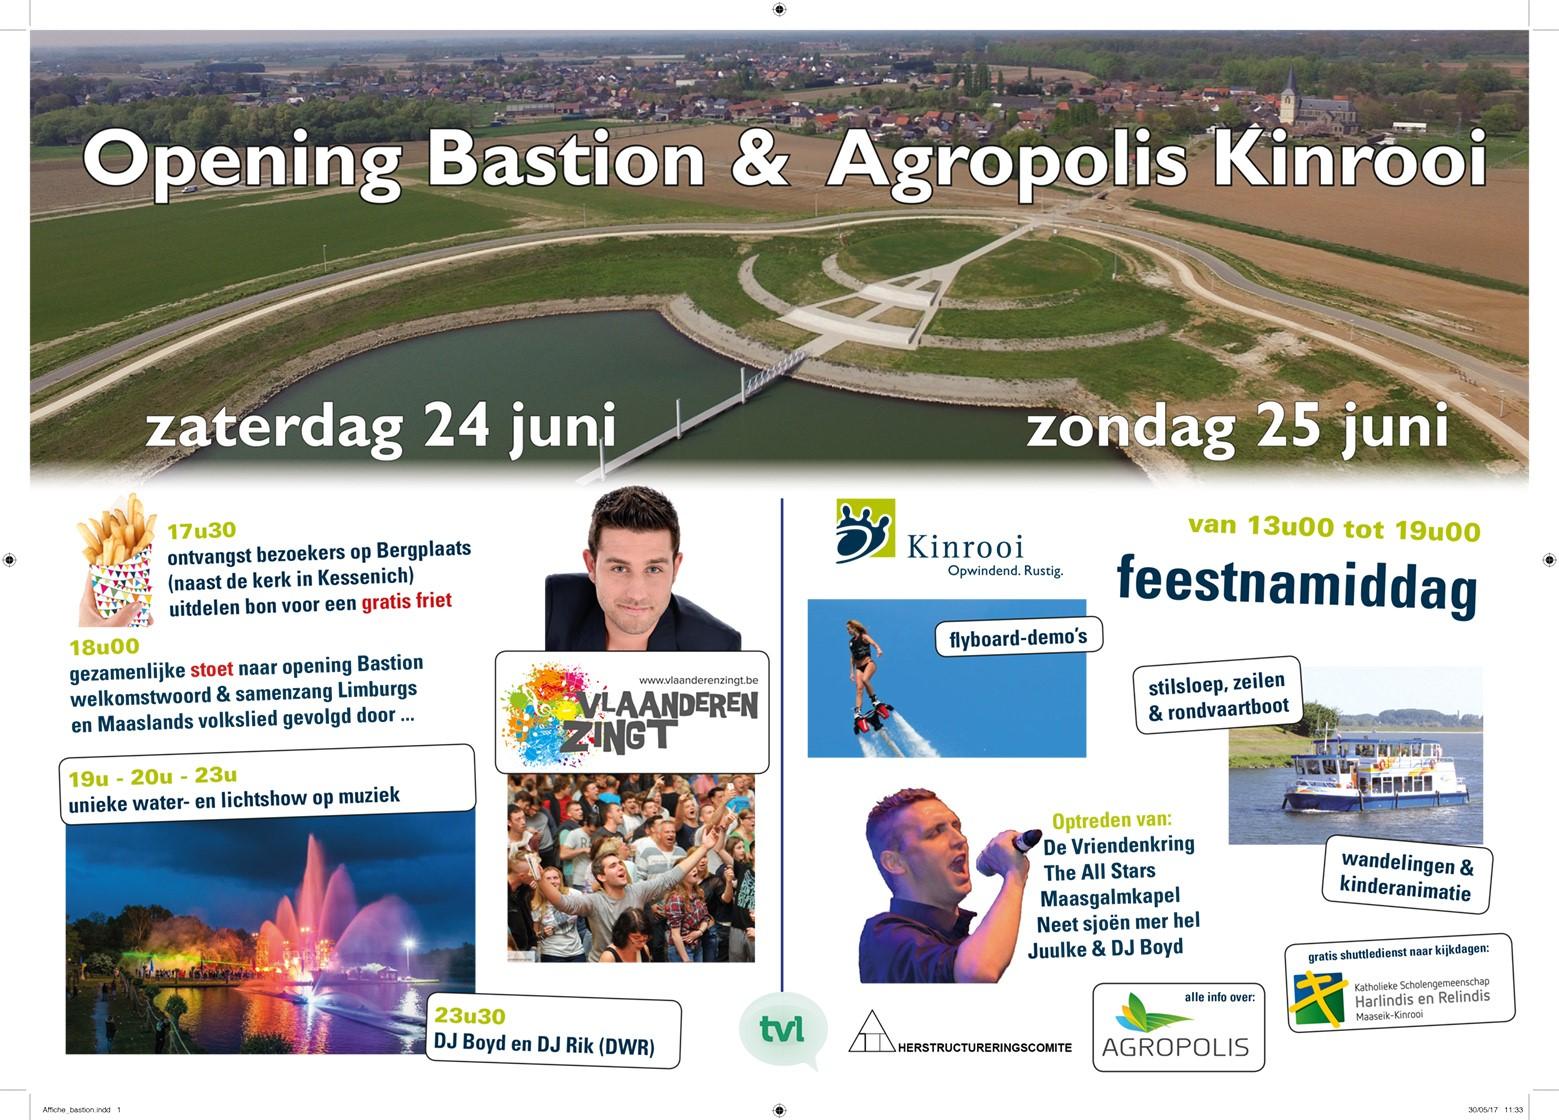 Opening Bastion en Agropolis Kinrooi